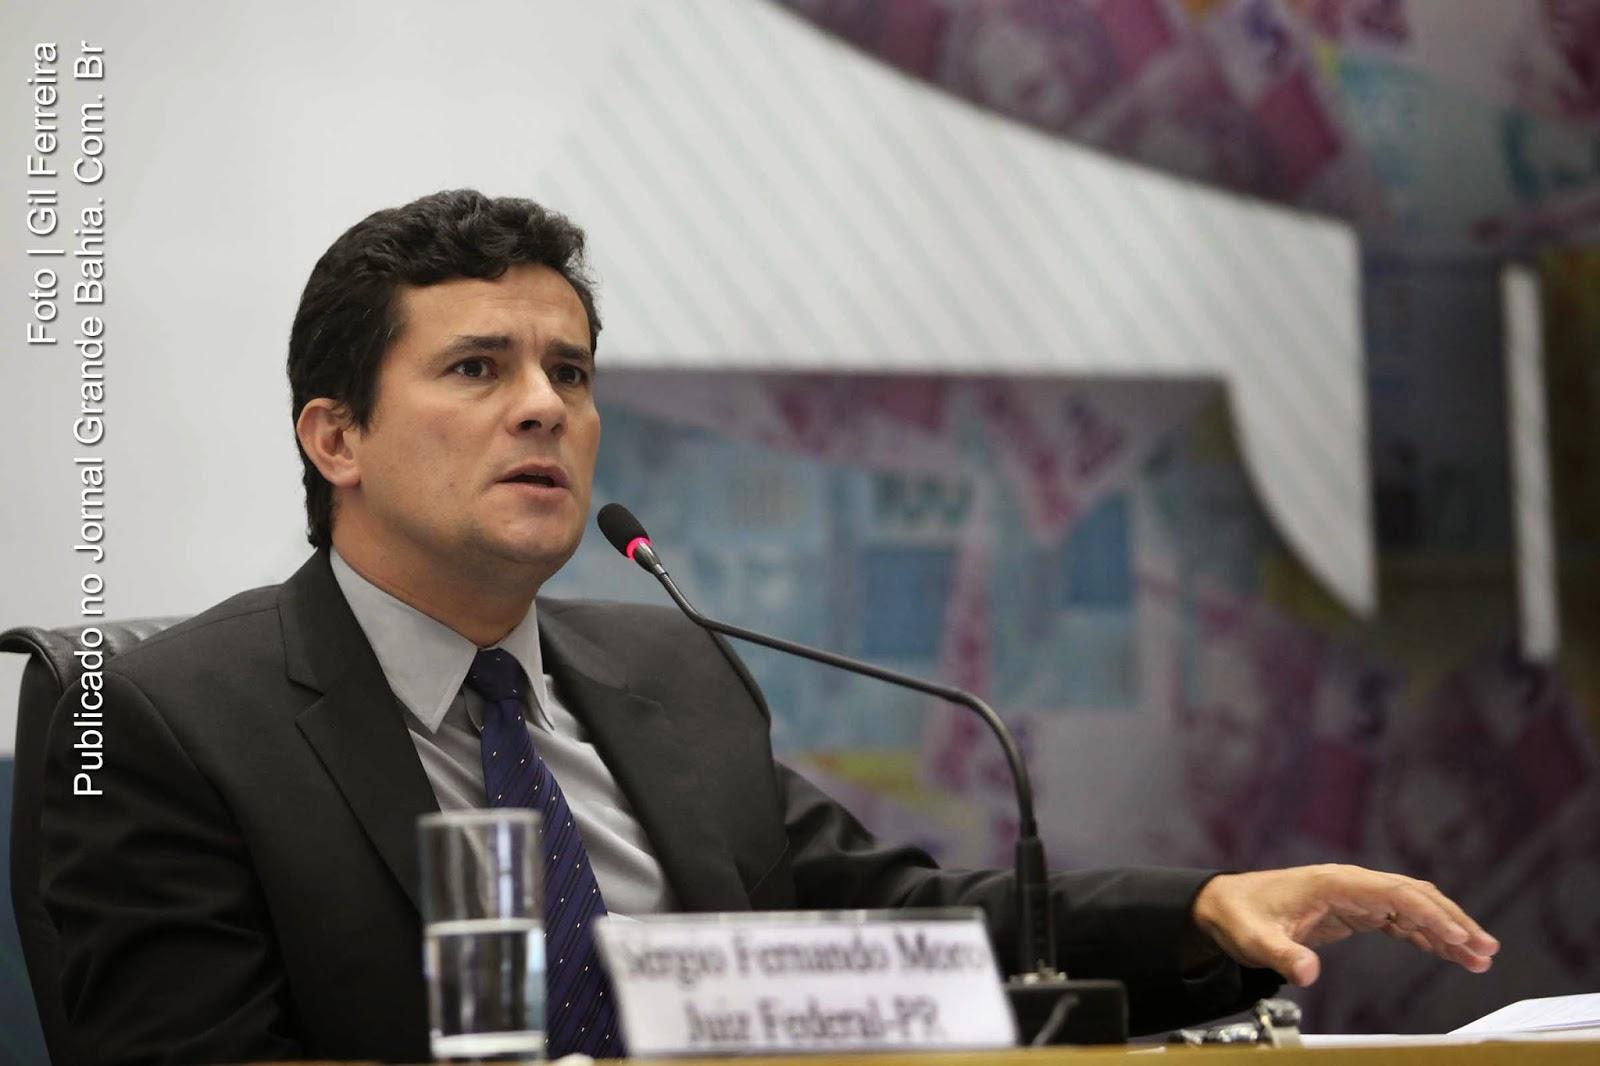 Sérgio Fernando Moro. - Sérgio Moro: Importante que as autoridades eleitas e os partidos ouçam a voz das ruas